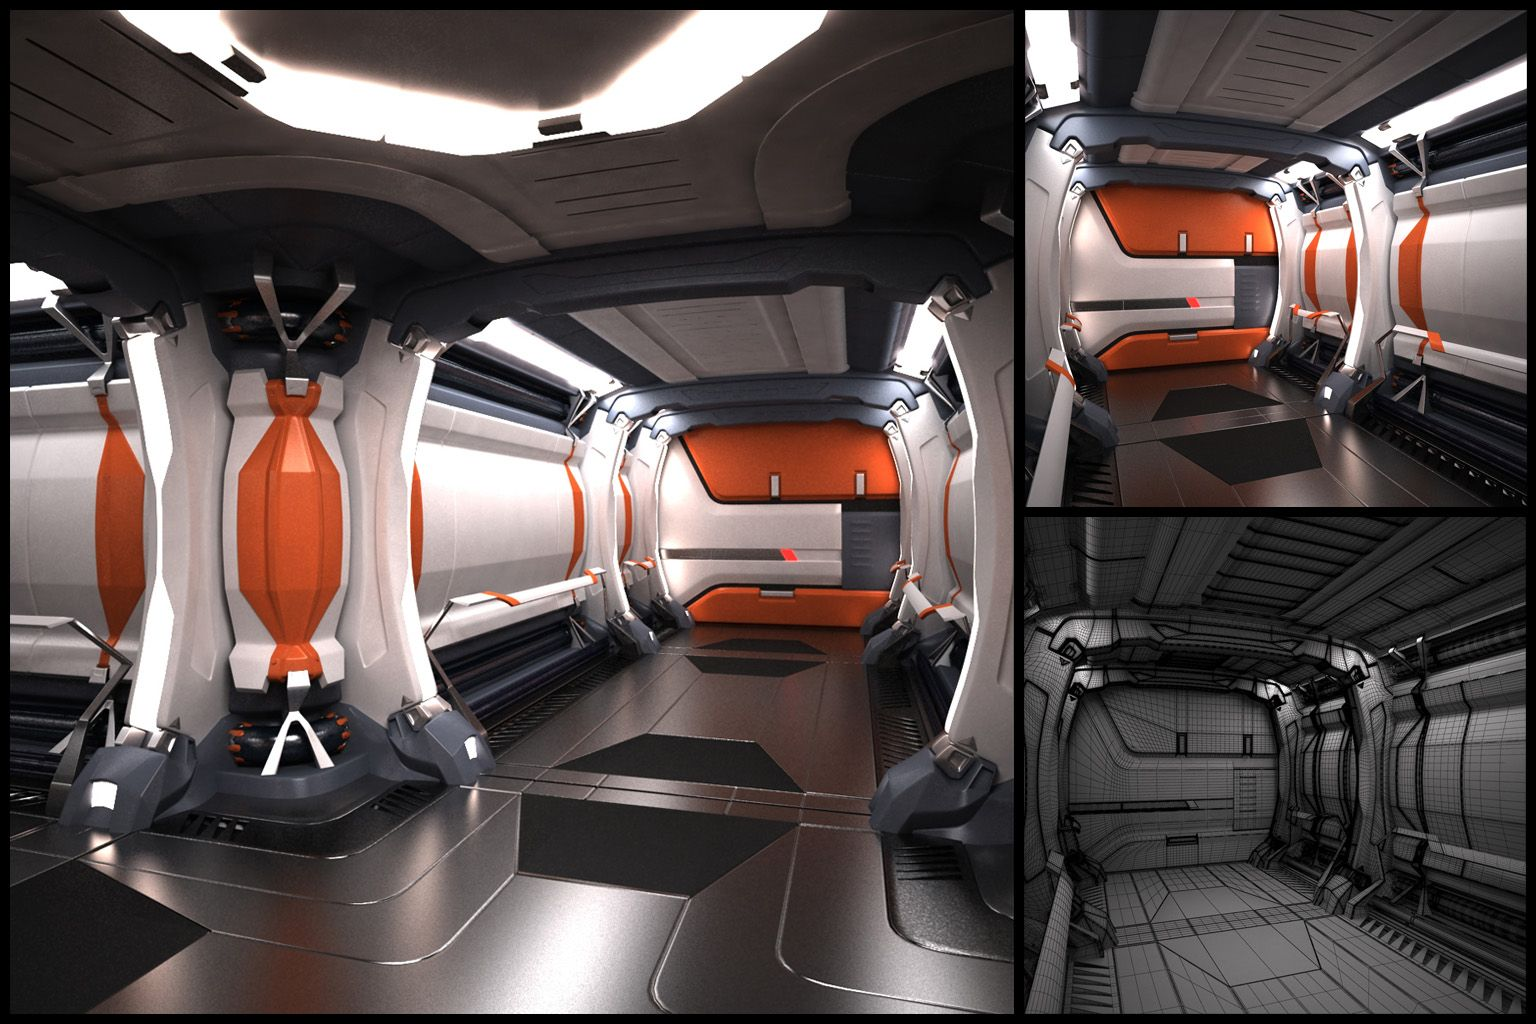 Scifi Hallway Corridor Interior Design